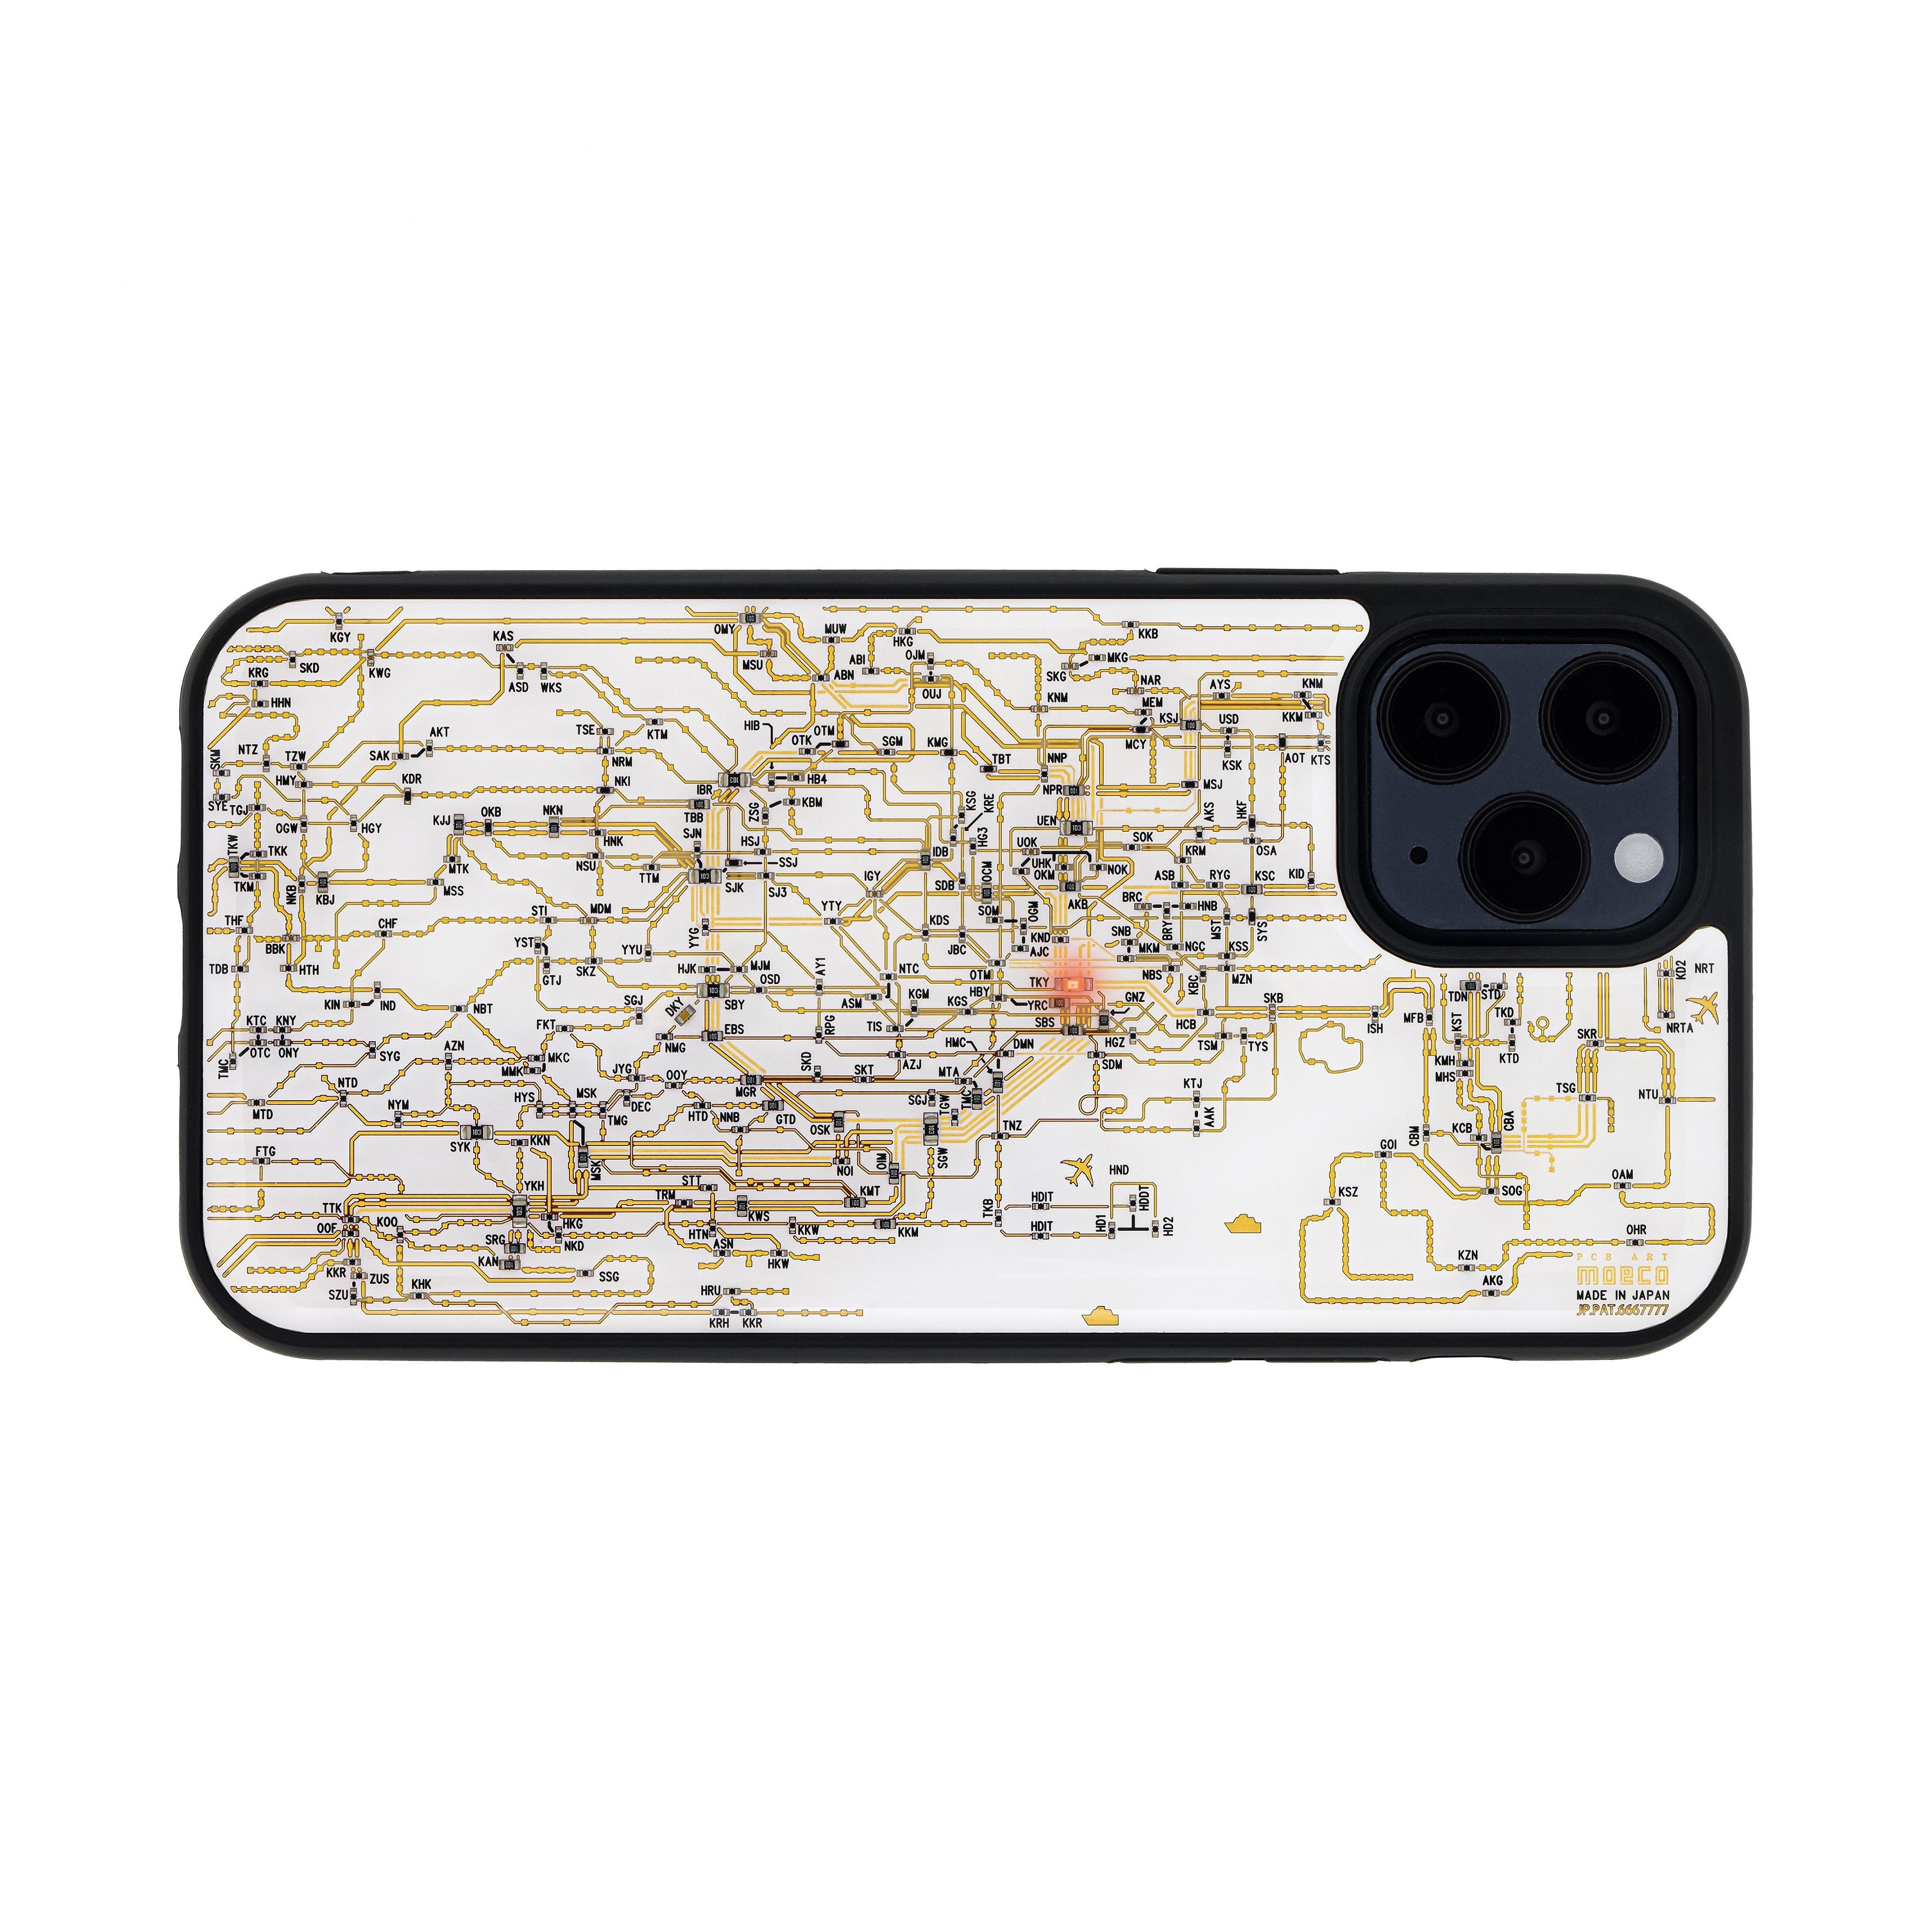 FLASH 東京回路線図 iPhone 12 / 12 Pro ケース 白【東京回路線図A5クリアファイルをプレゼント】